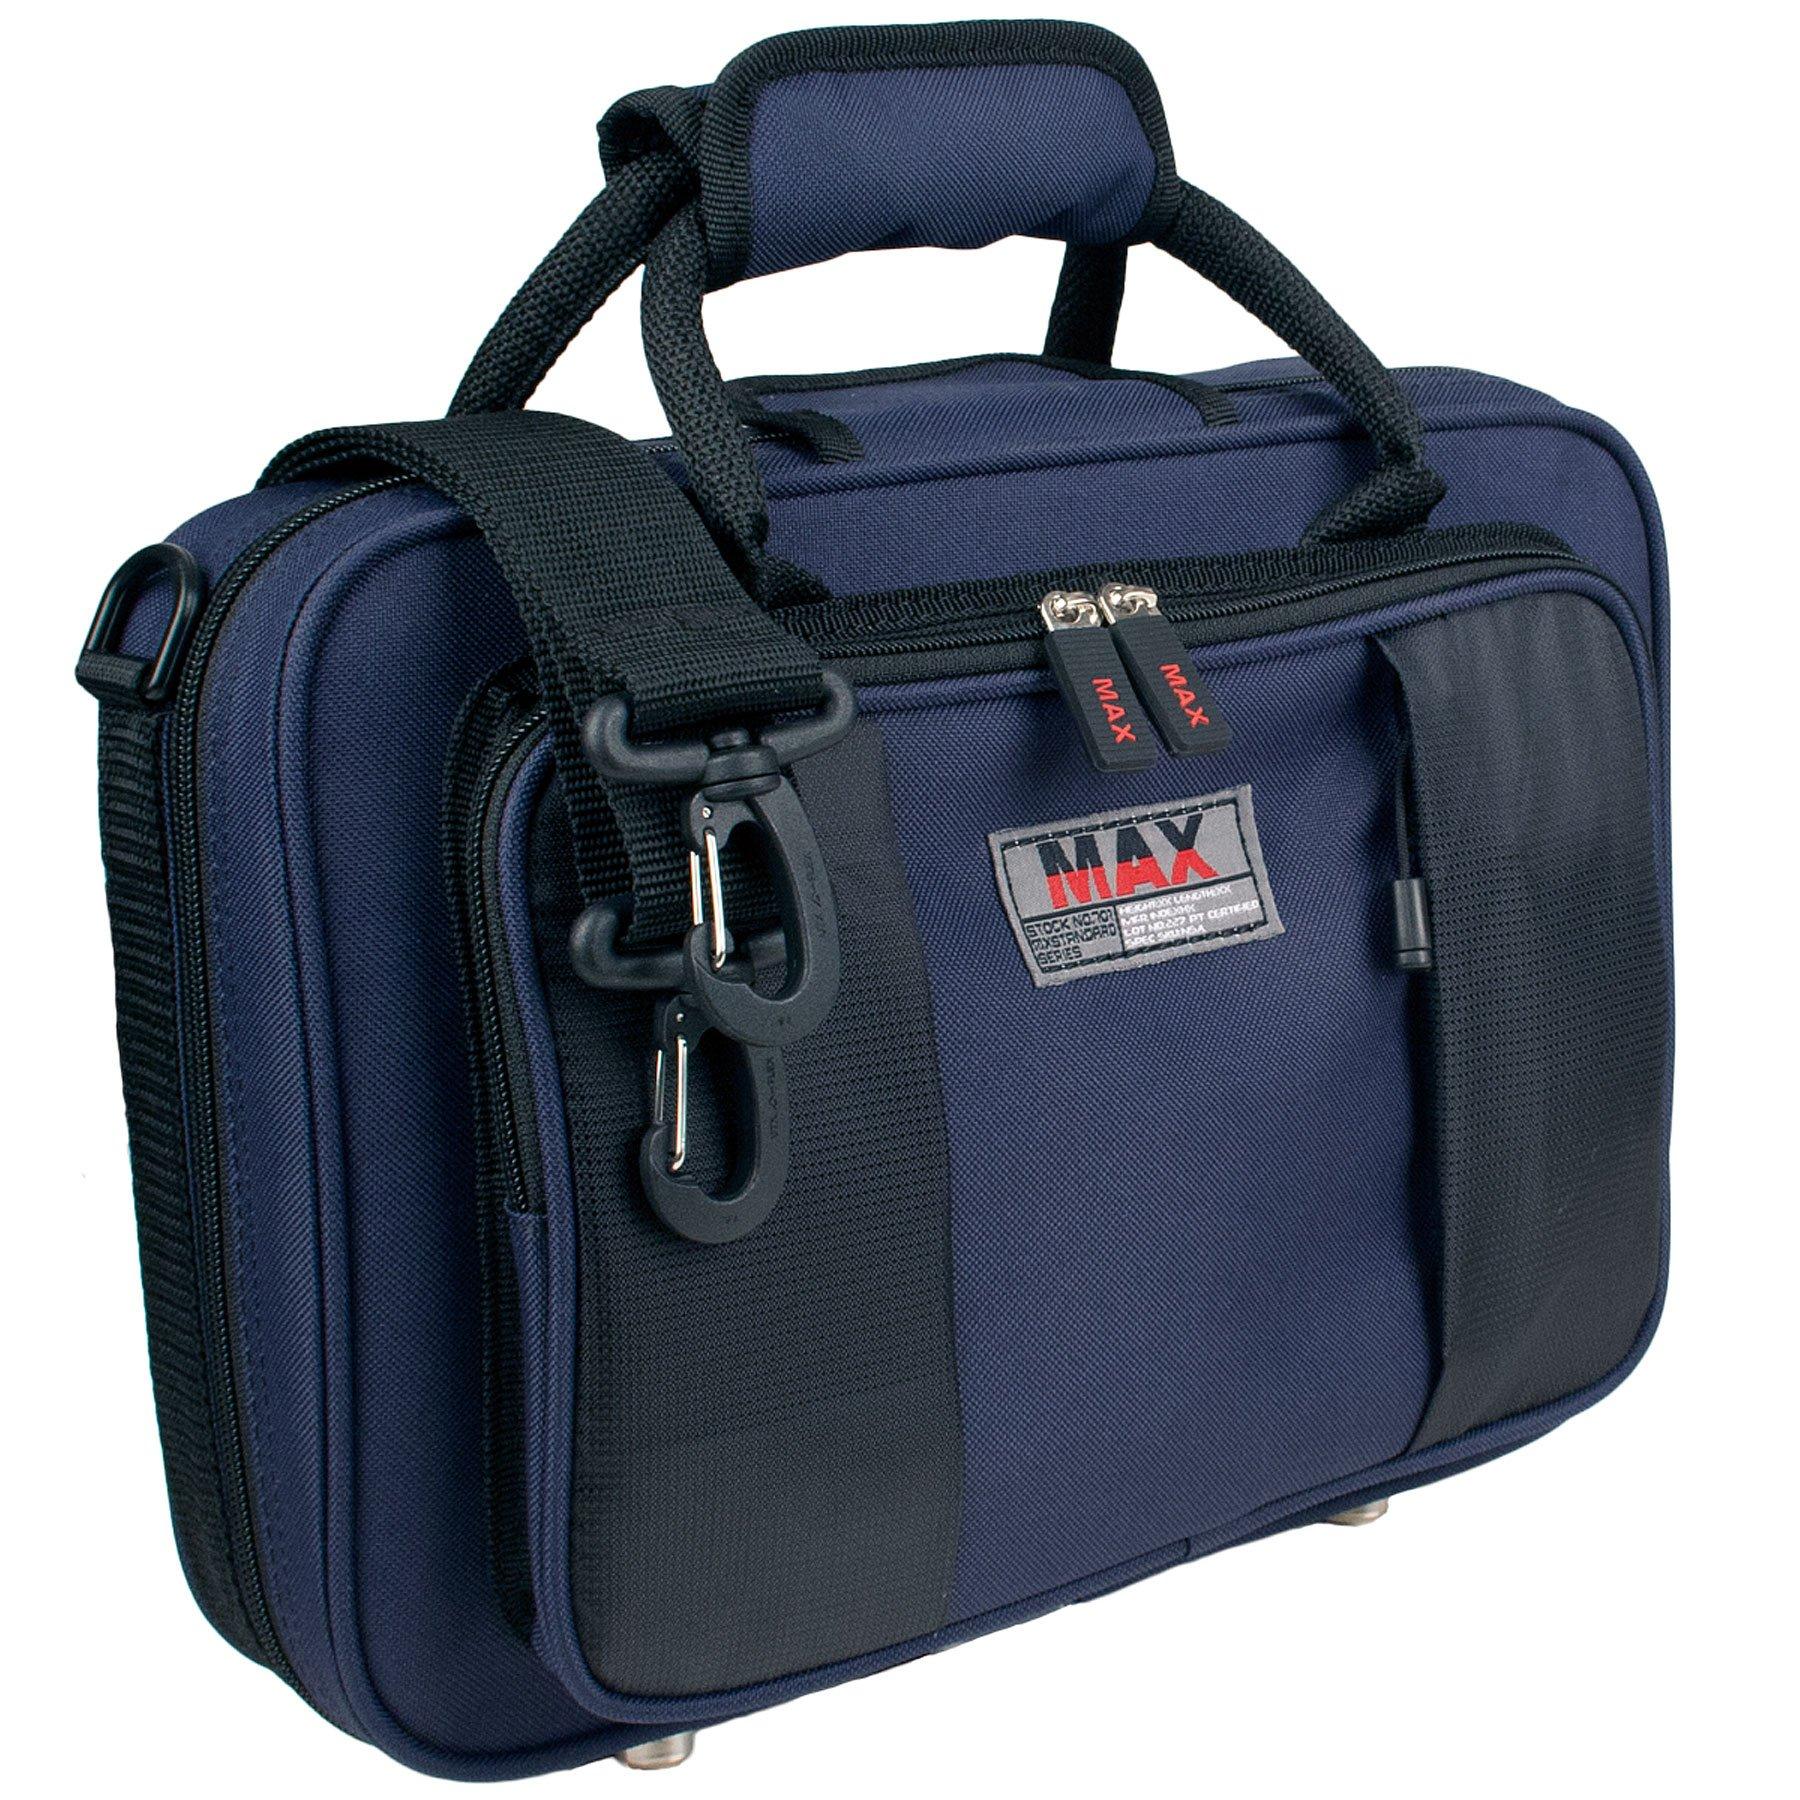 Protec Oboe MAX Case (Blue), Model MX315BX